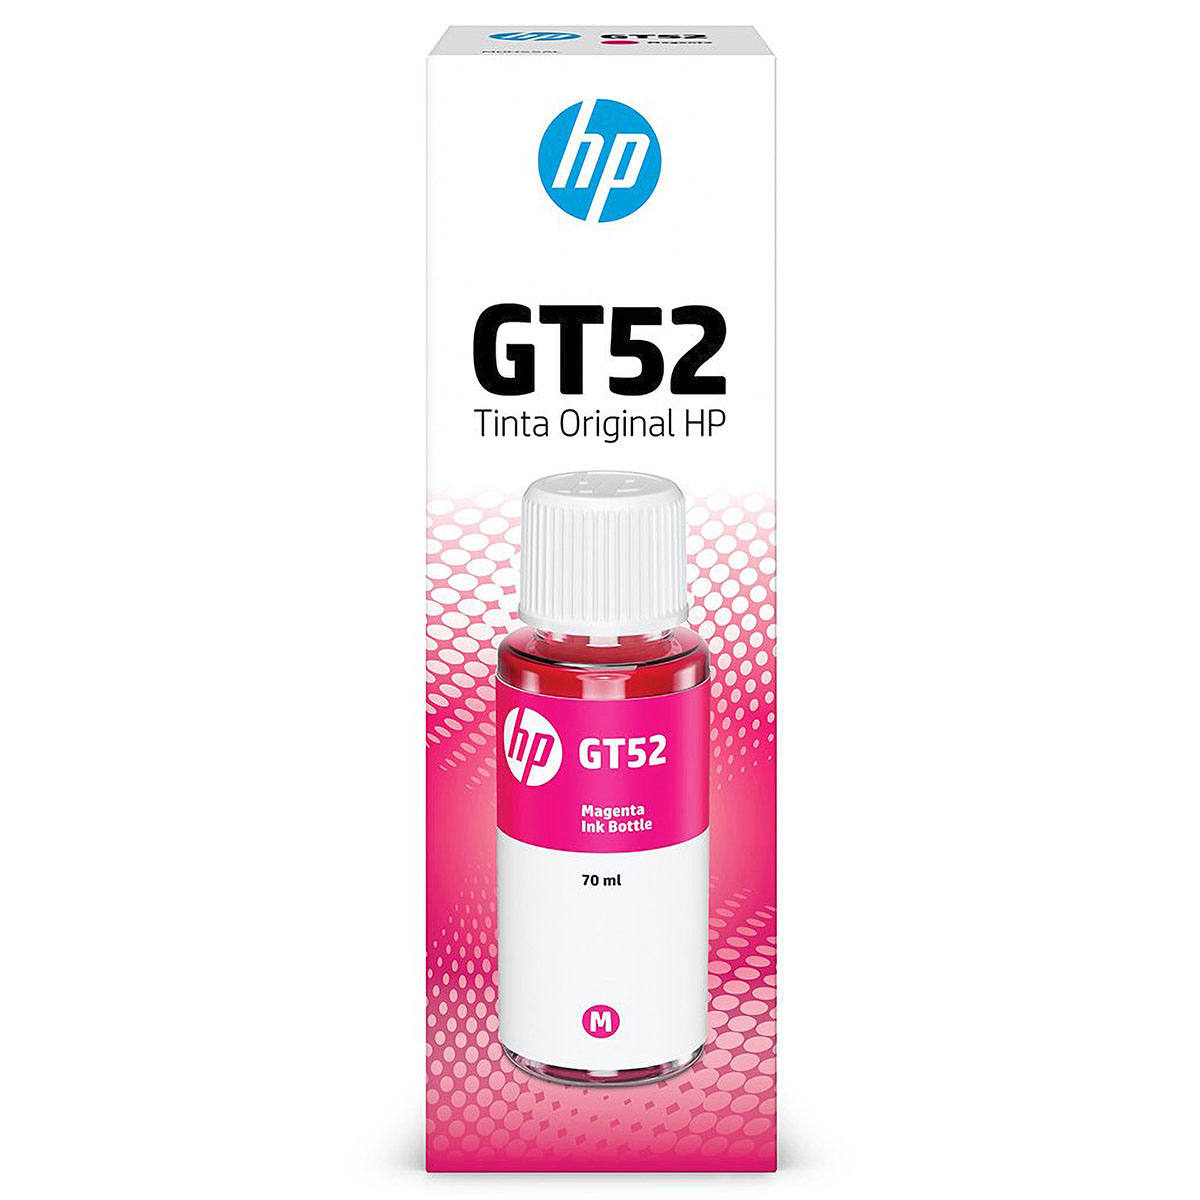 Tinta HP GT52 GT 52M M0H55AL Original Magenta para HP Deskjet GT 5822 416 116 Smart Tank 517 532 617 Garrafa de 70ml